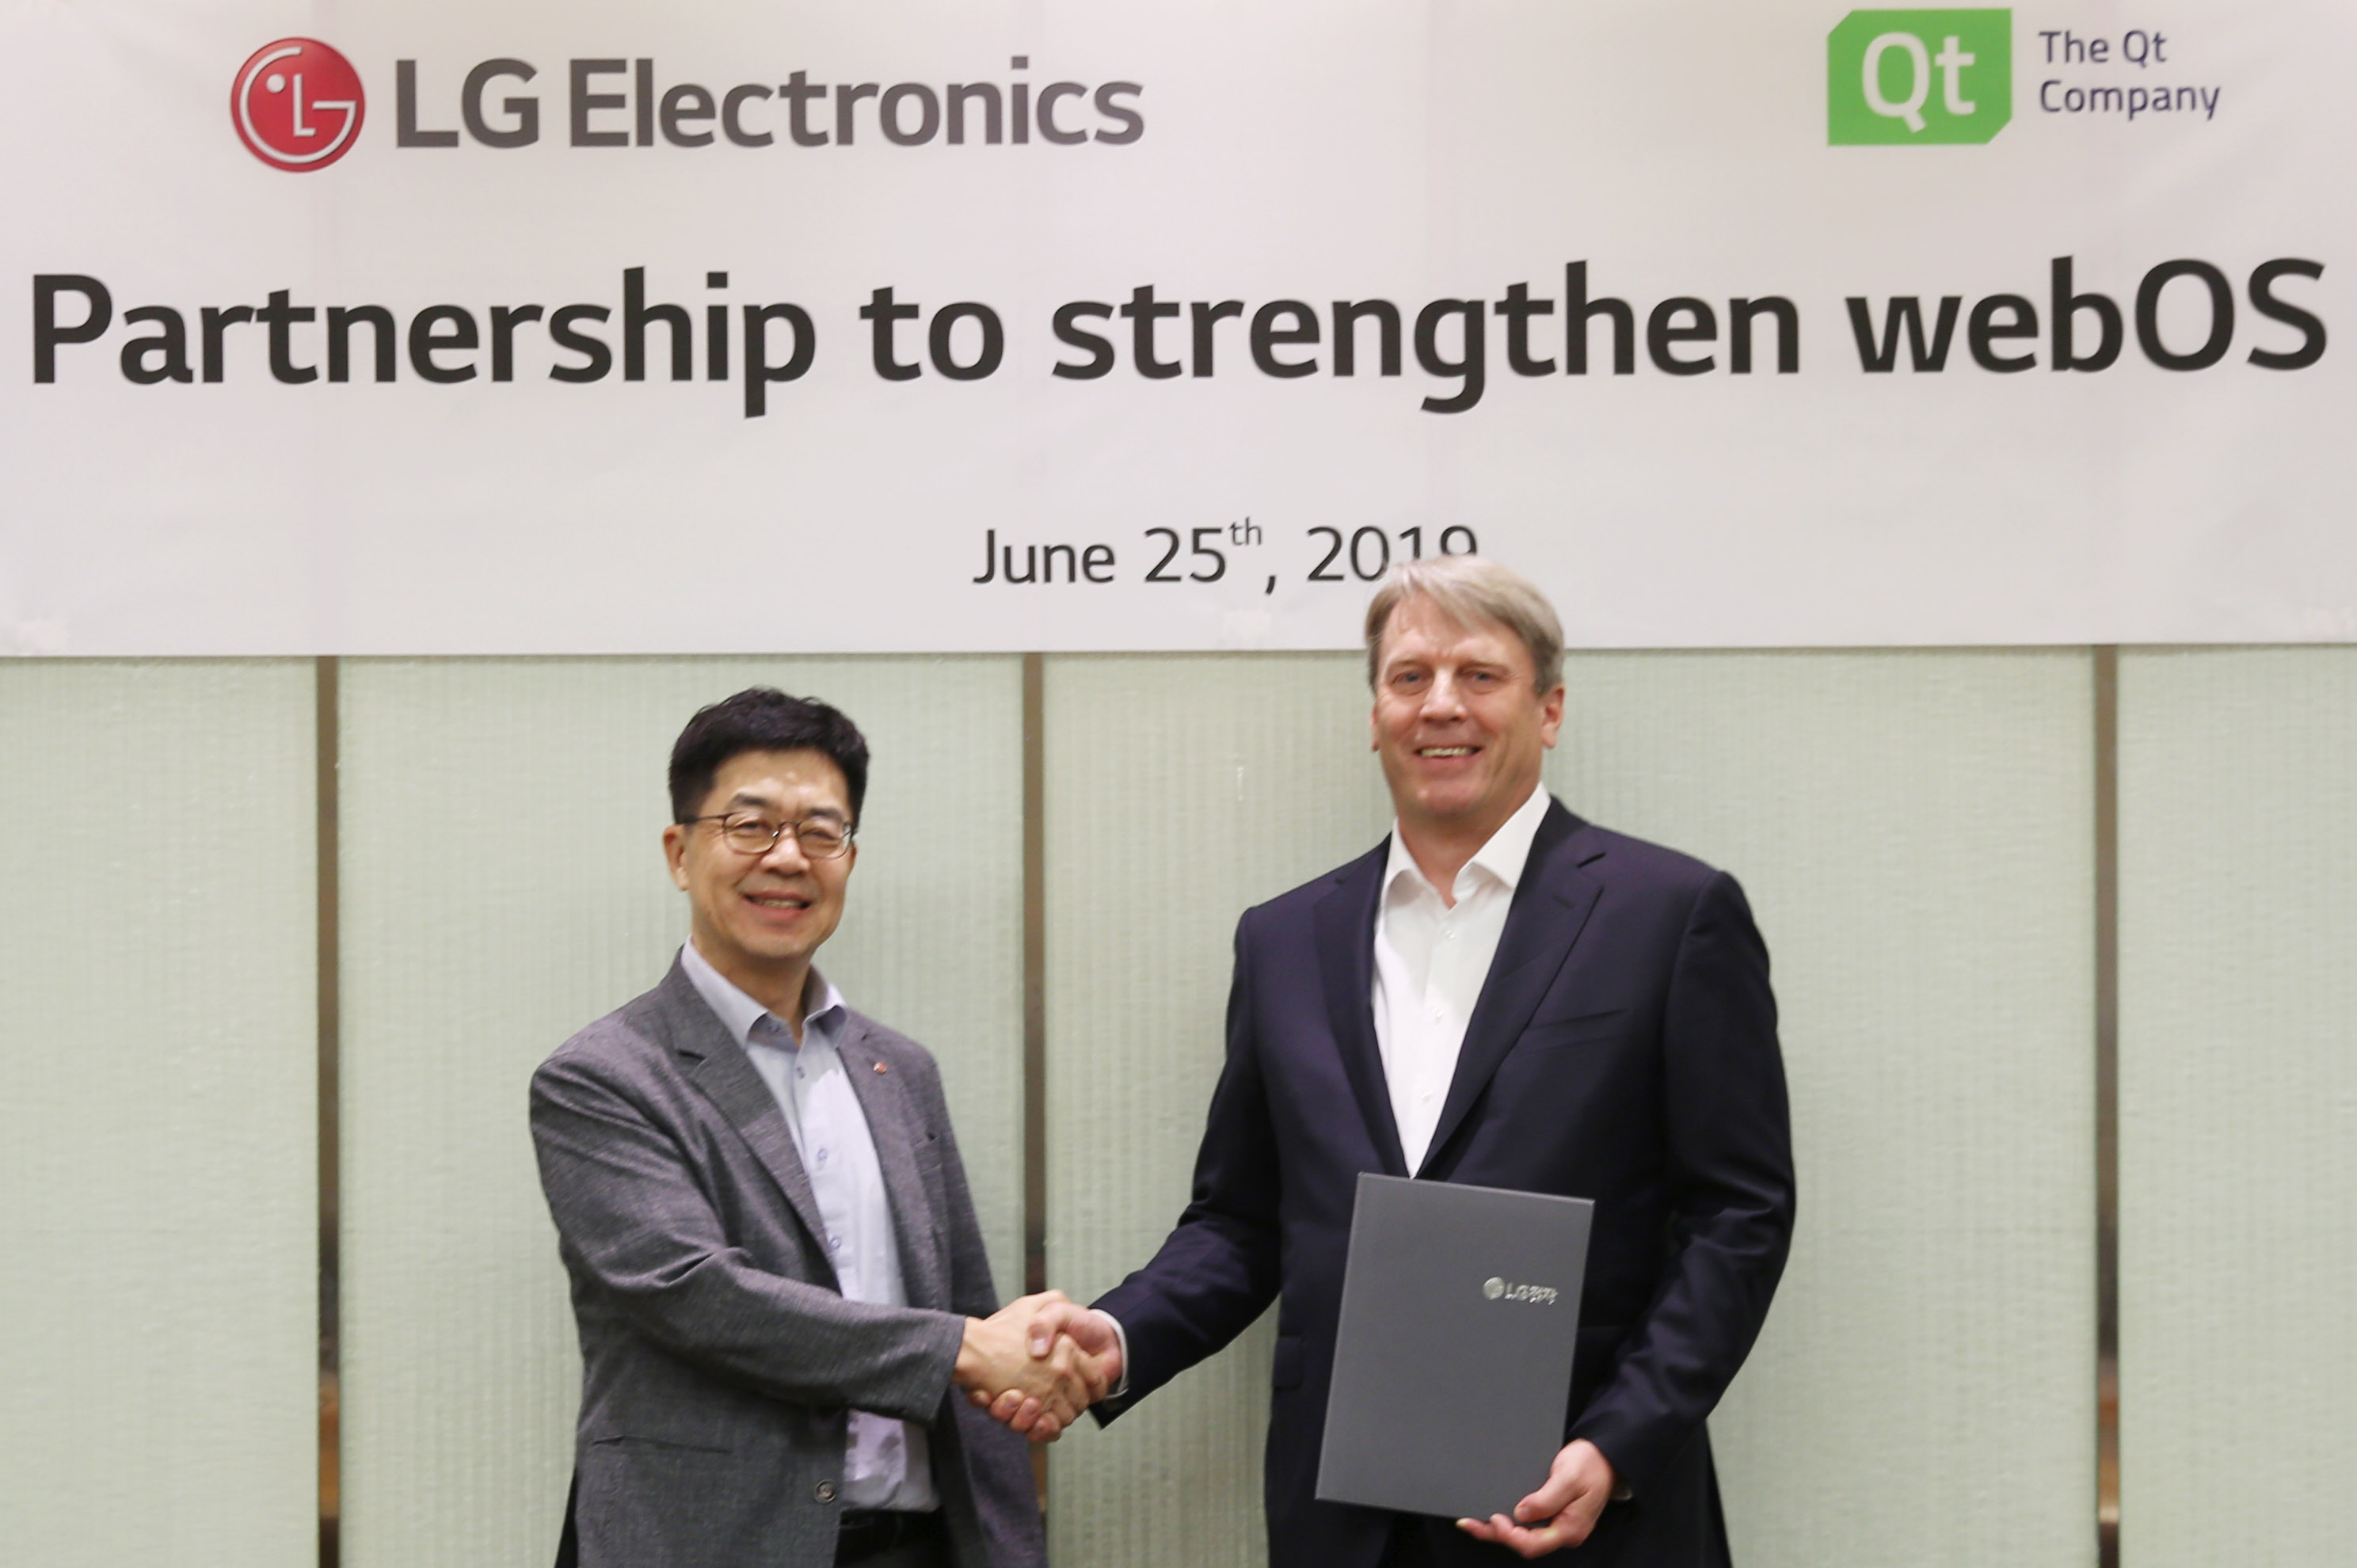 ▲ LG전자 CTO 박일평 사장(왼쪽), Qt社 CEO 유하 바렐리우스가 MOU를 체결한 뒤 악수하고 있다.